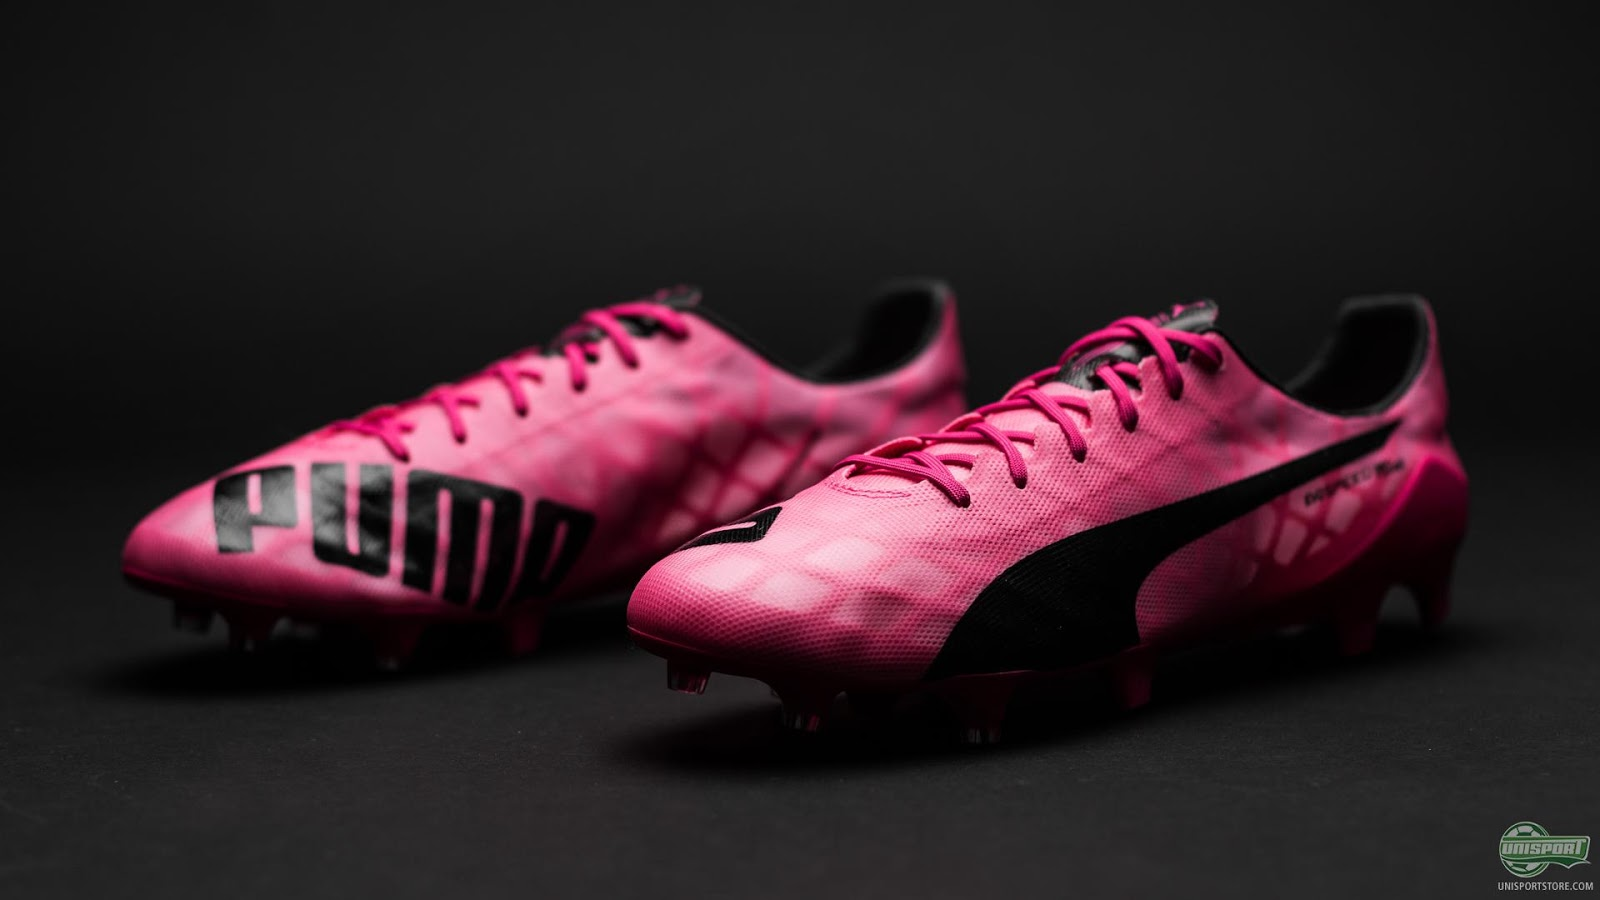 harga puma evospeed pink